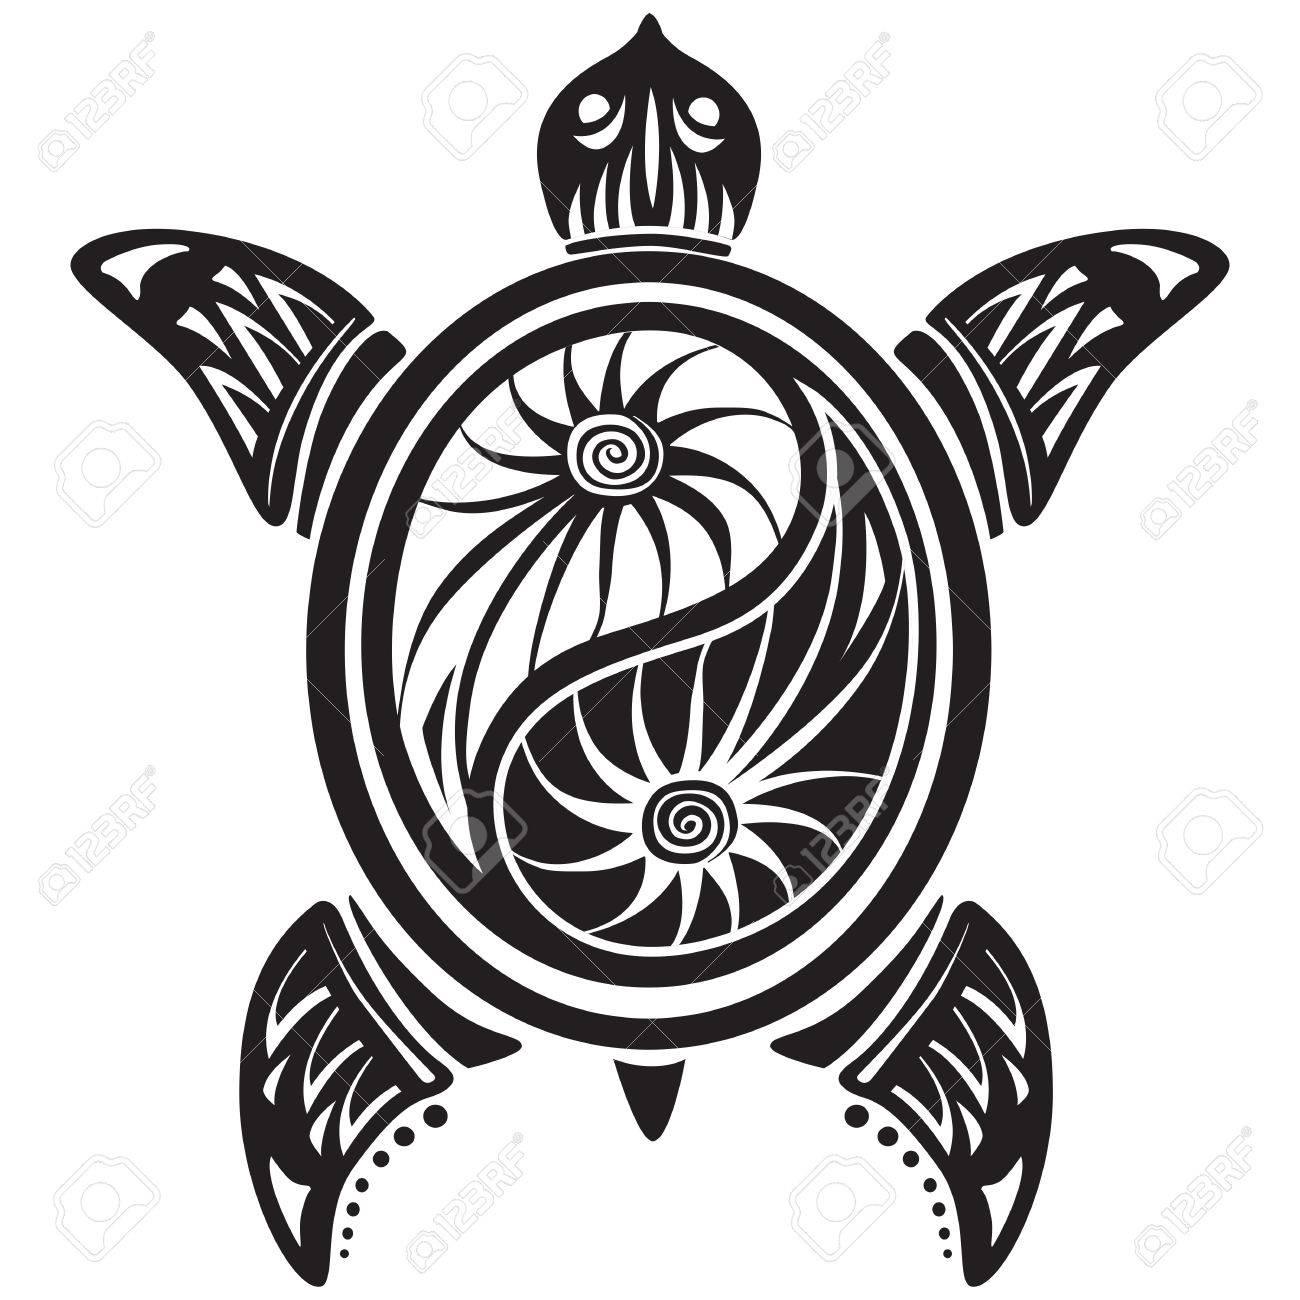 Decorative turtle - 61998864